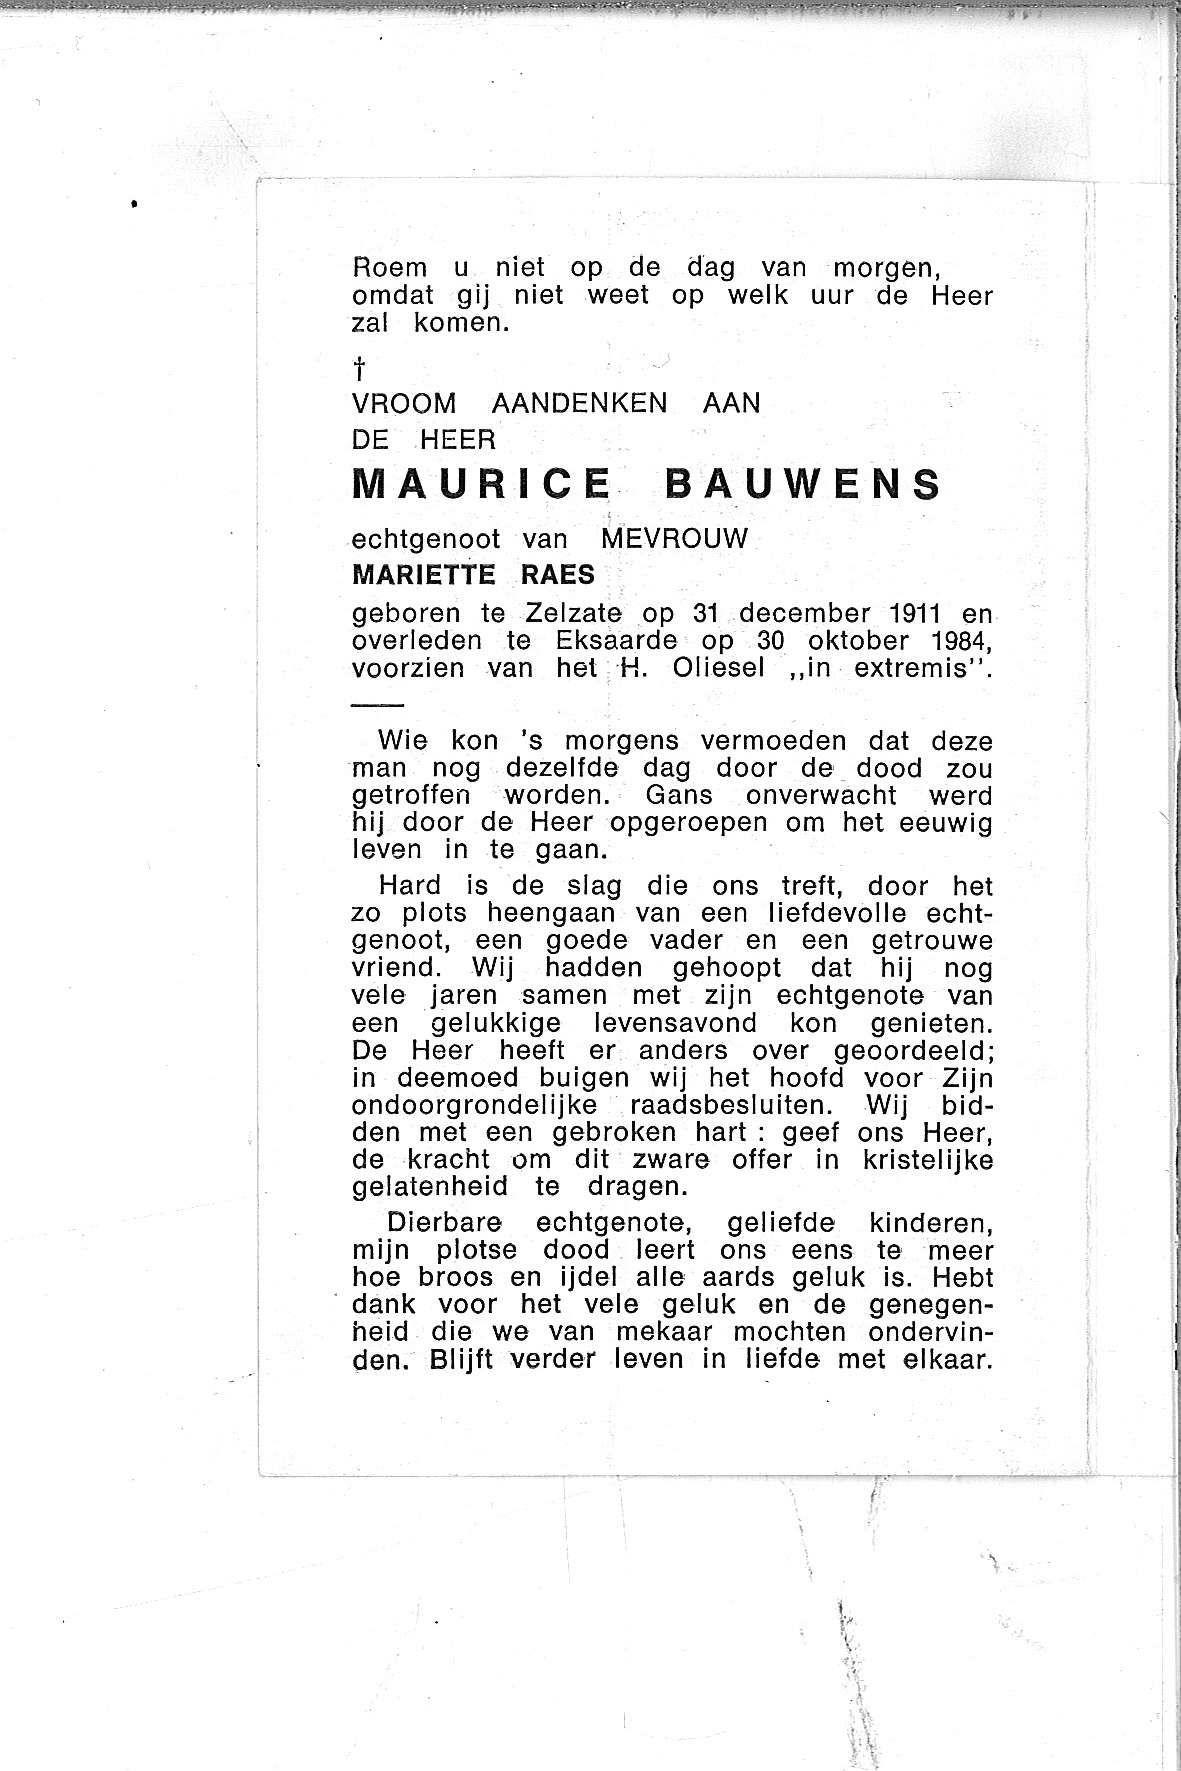 Maurice(1984)20130828133432_00053.jpg